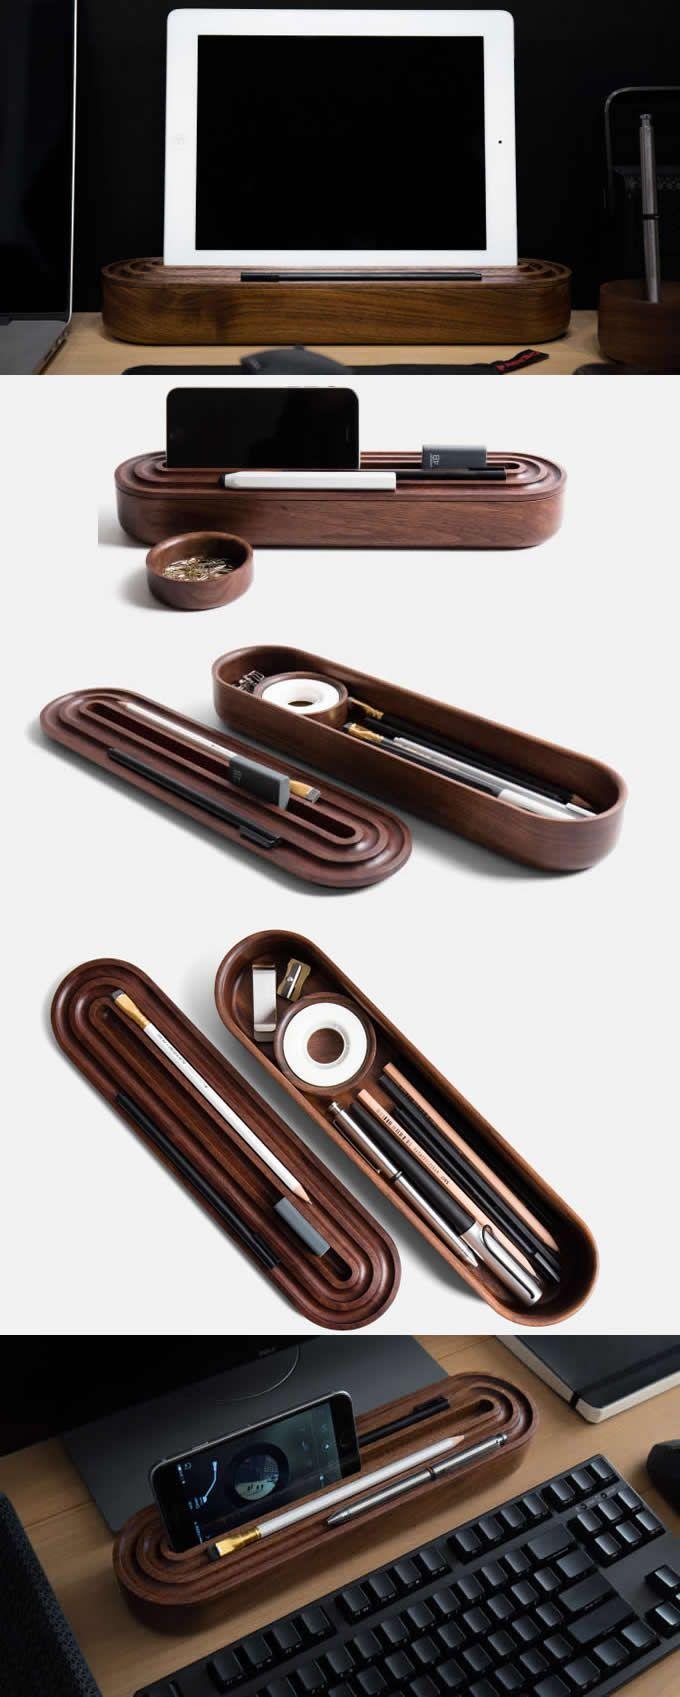 Wooden Office Desk Stationery  Organizer  Pen Pencil Holder Case Stationery Storage Box Smart Phone iPad Holder